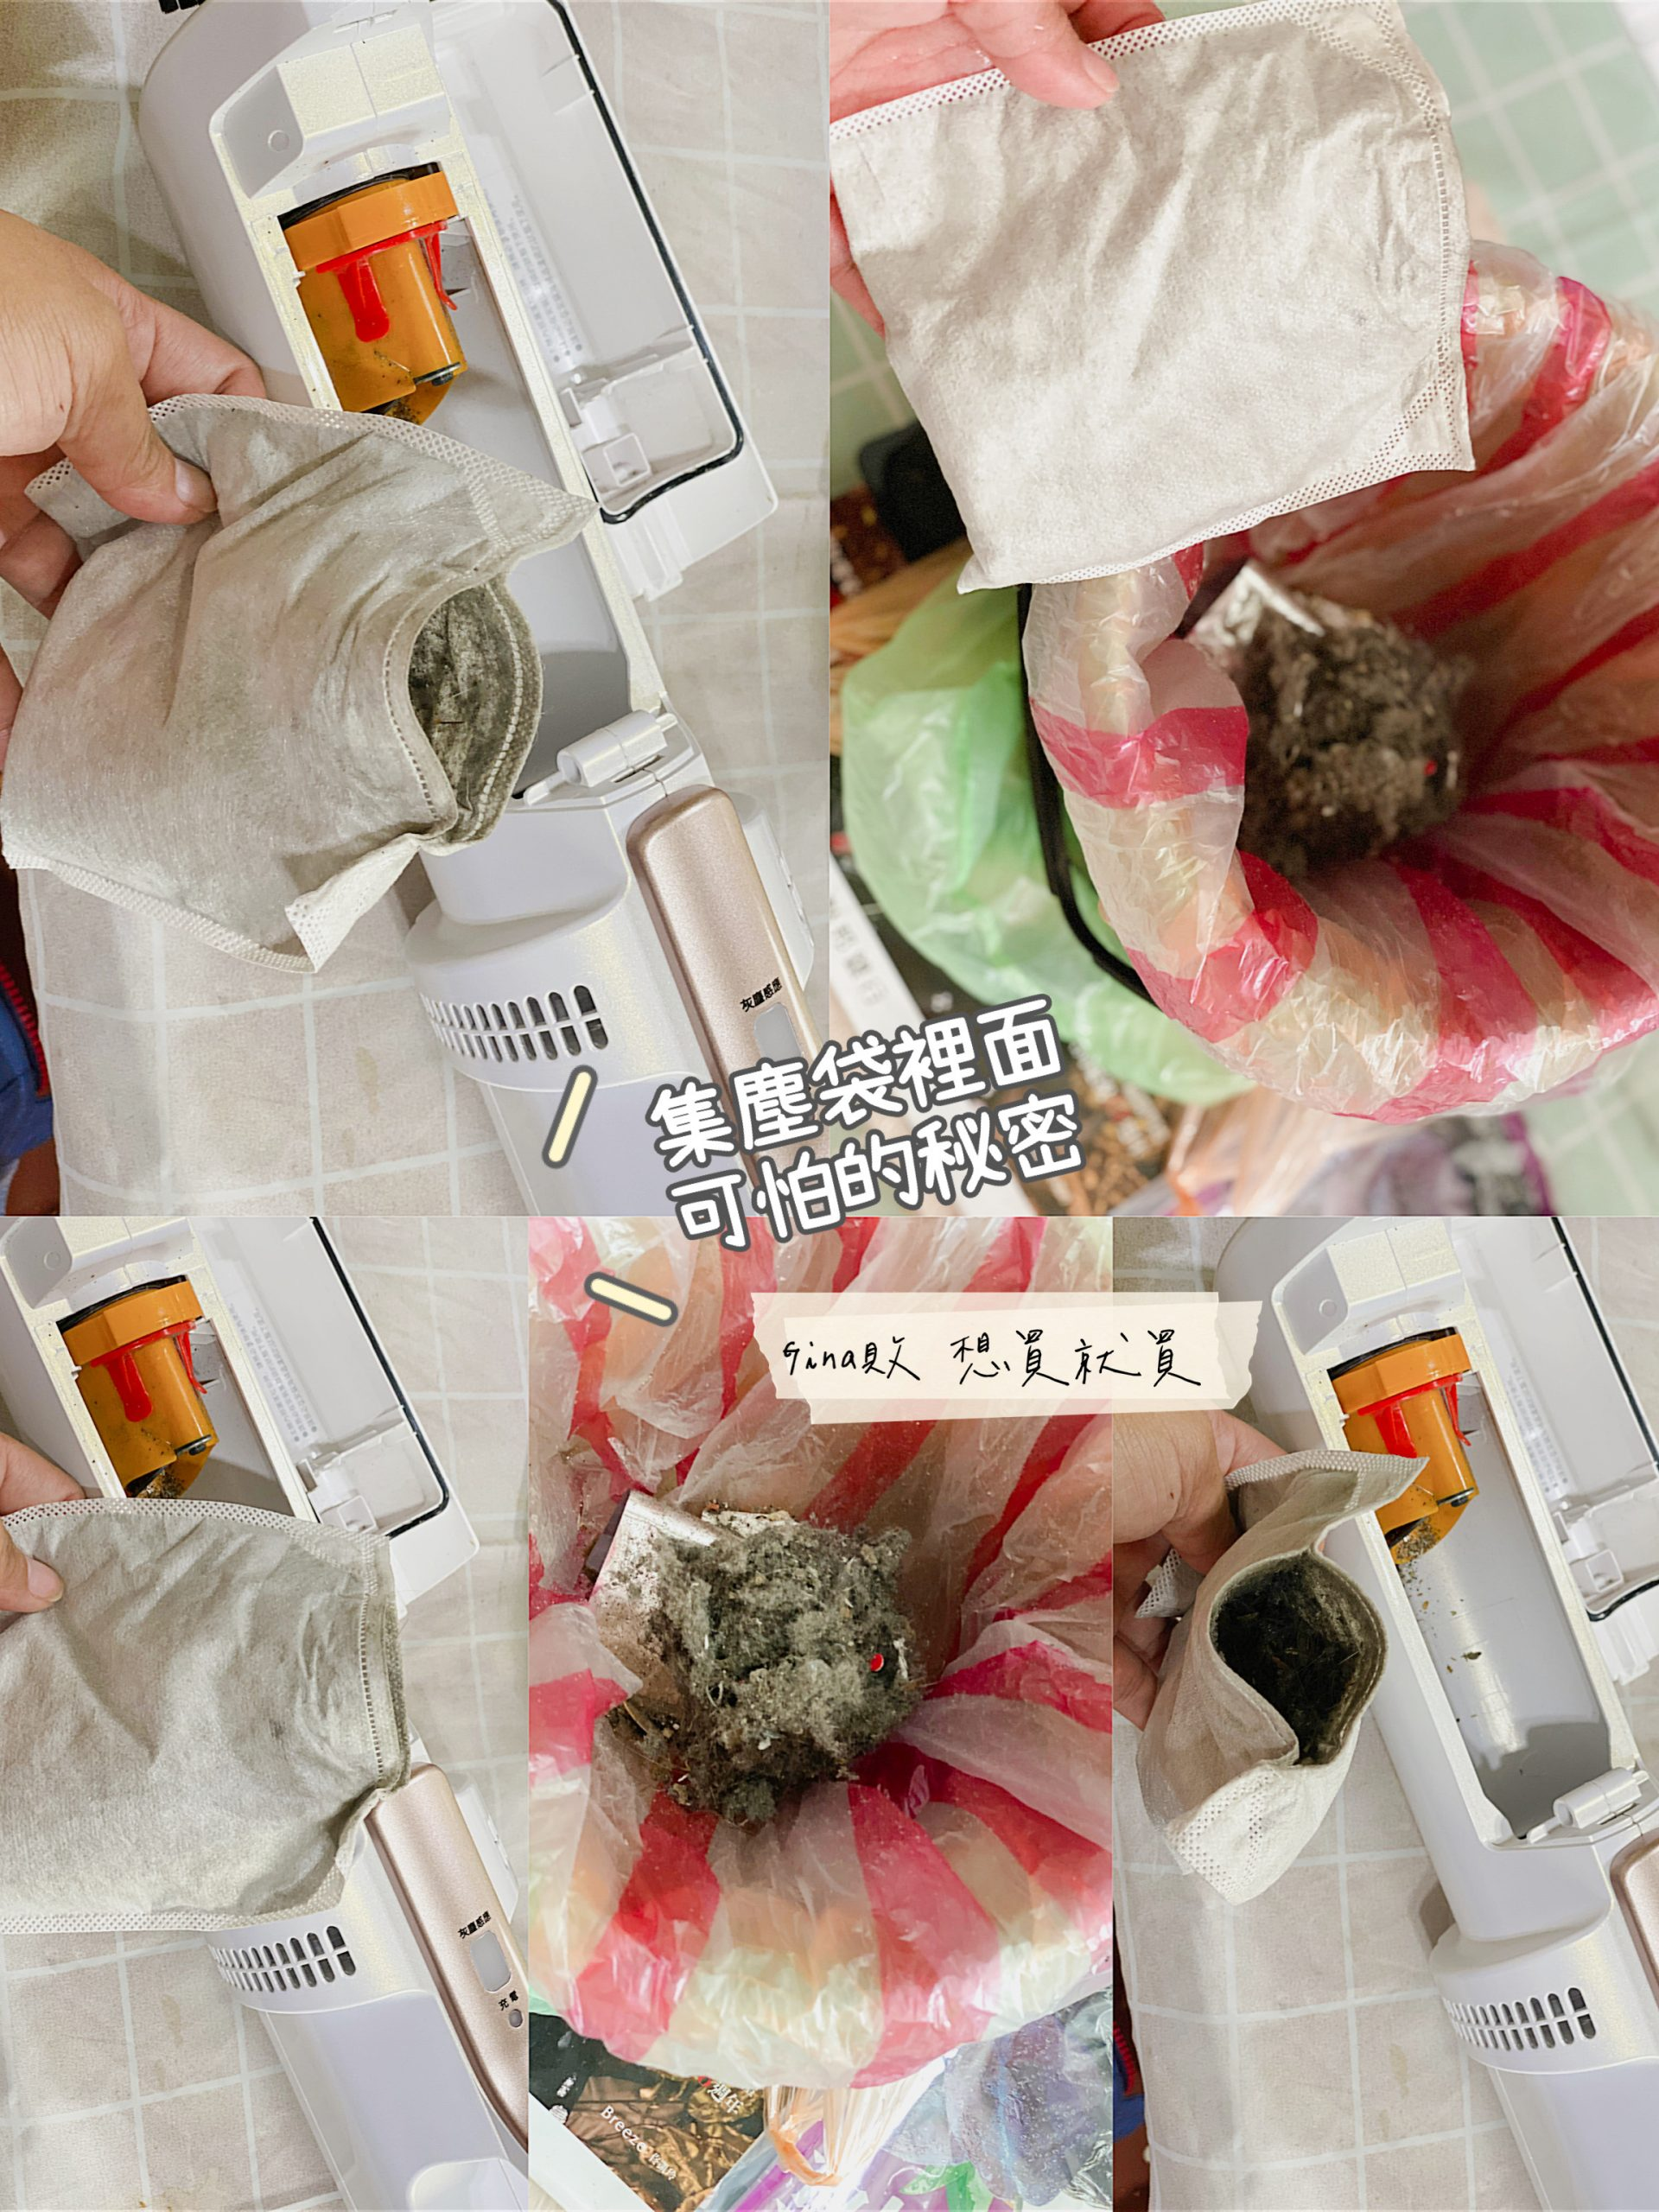 【IRIS團購吸塵器】日本IRIS SLDCP6(玫瑰金)超美輕巧吸塵器!充電式無線吸塵器 @GINA環球旅行生活